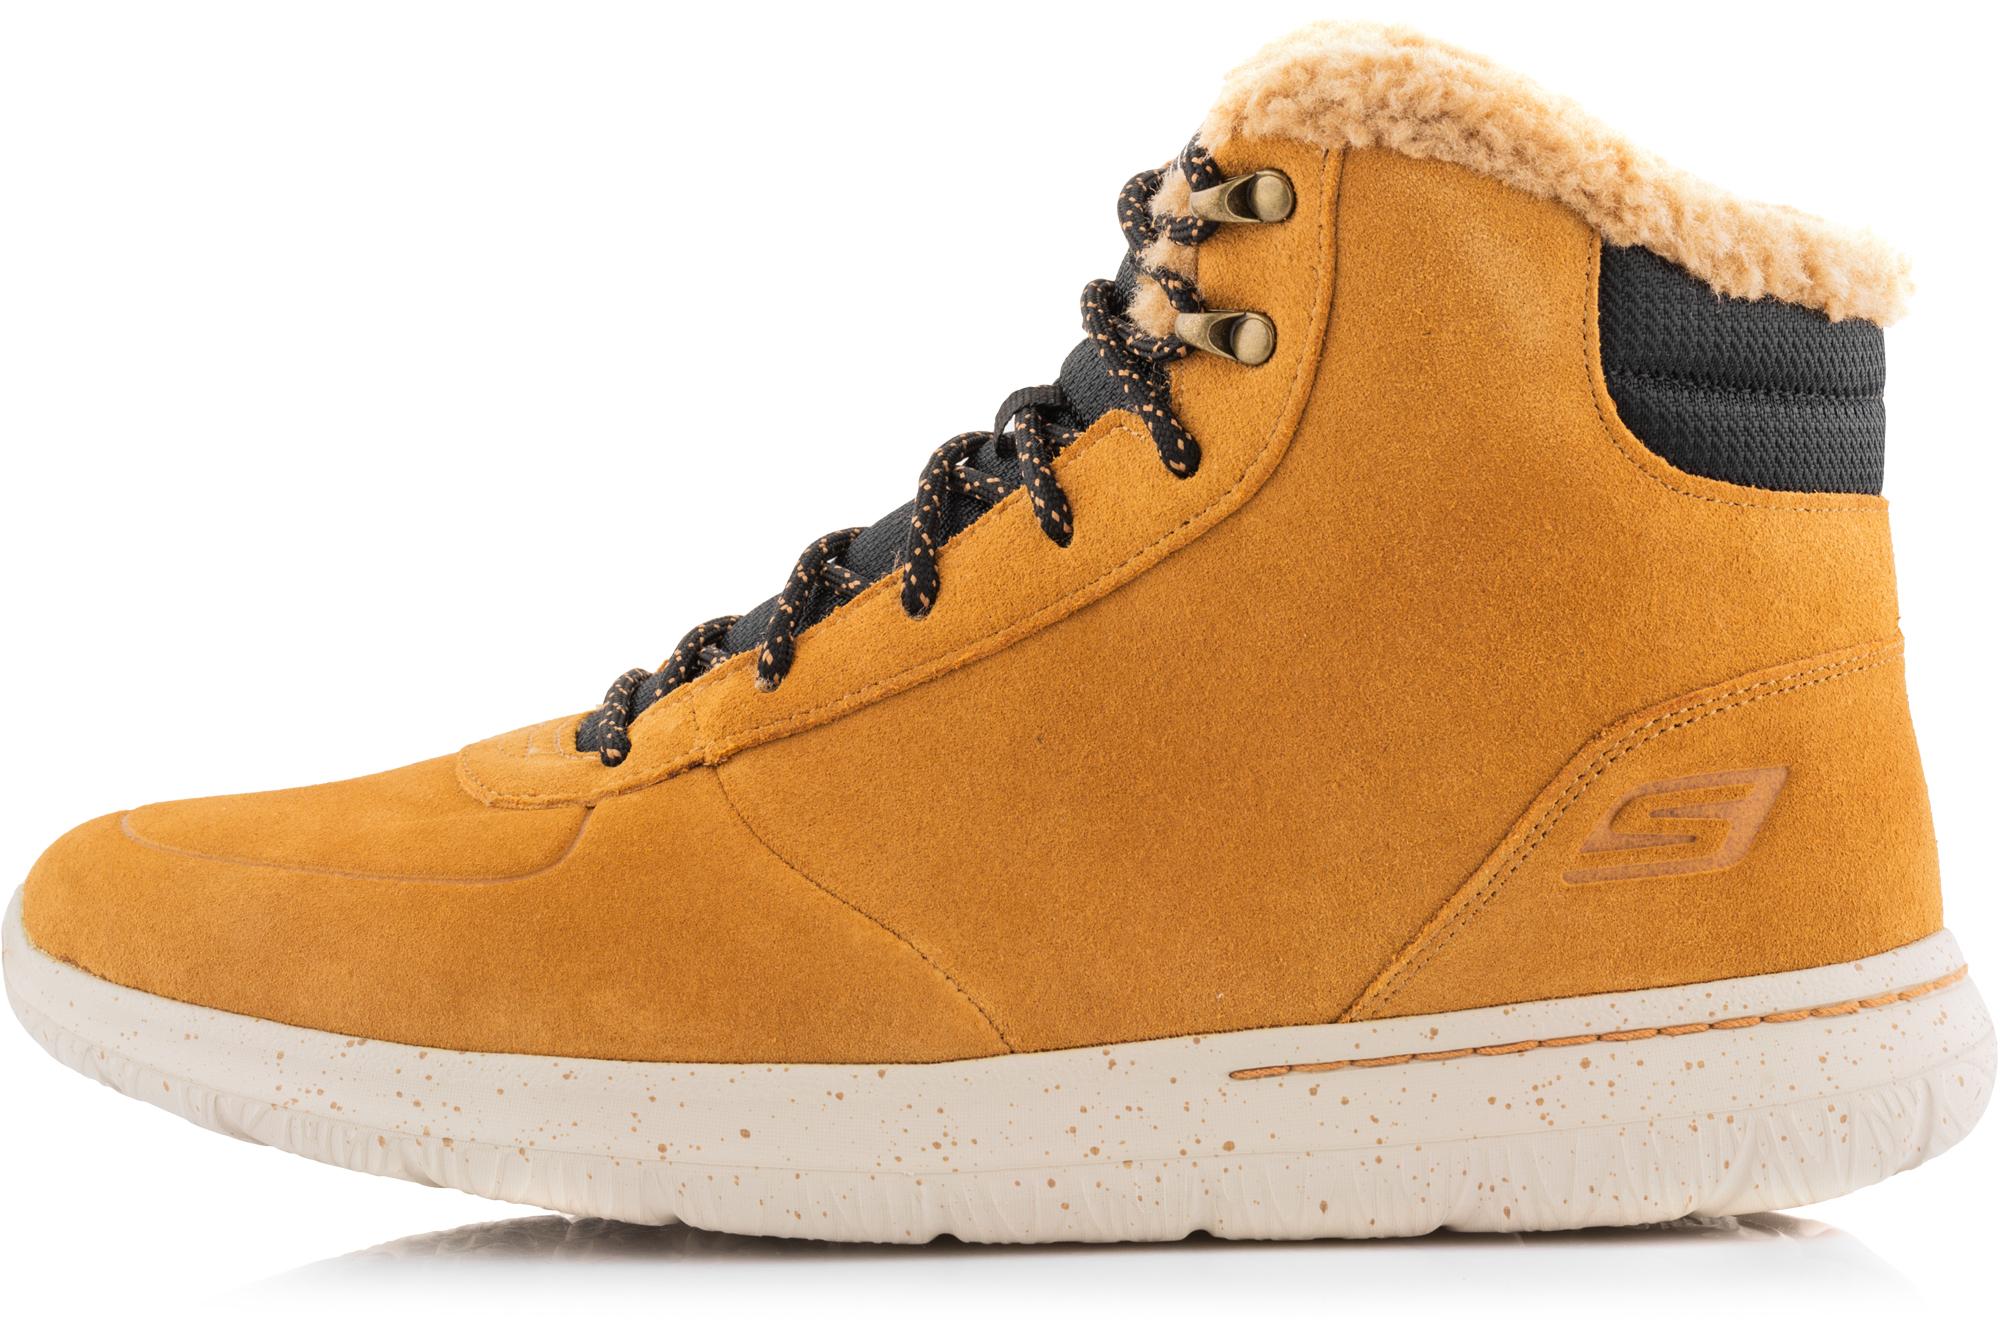 Skechers Ботинки утепленные мужские Skechers Go Walk City-Sierra, размер 43,5